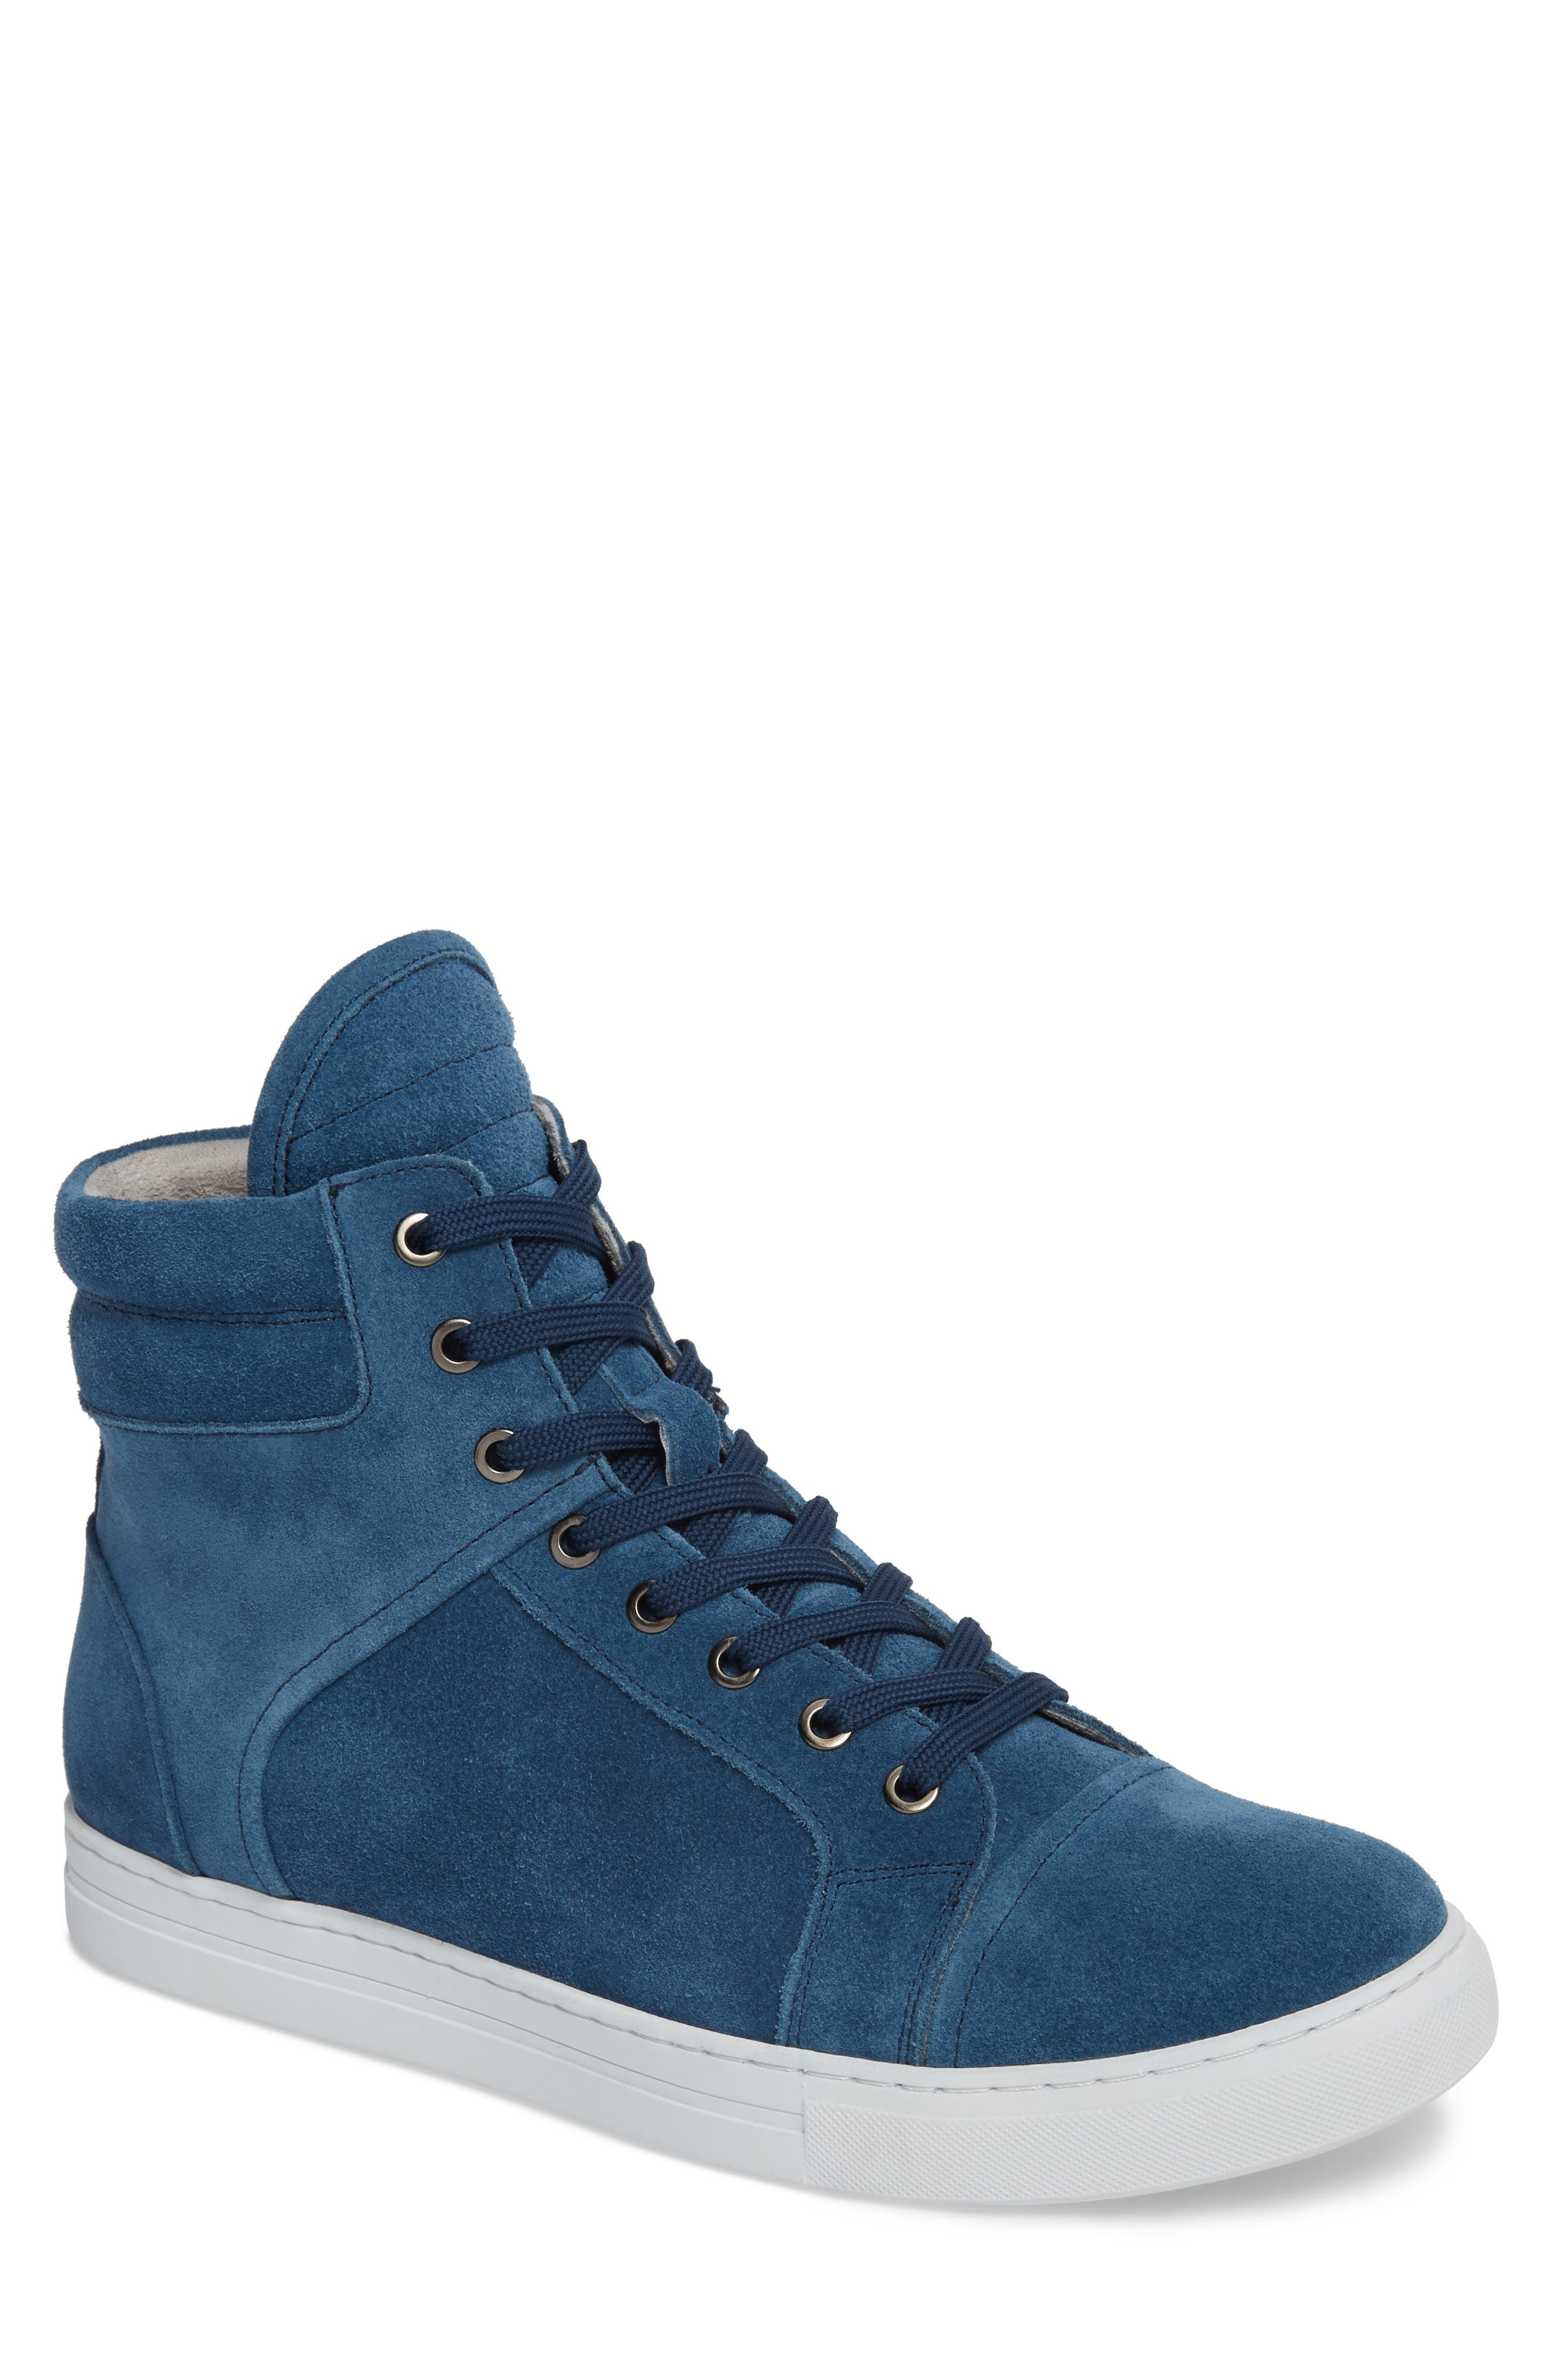 Double Header Sneaker,                             Main thumbnail 1, color,                             Blue Suede